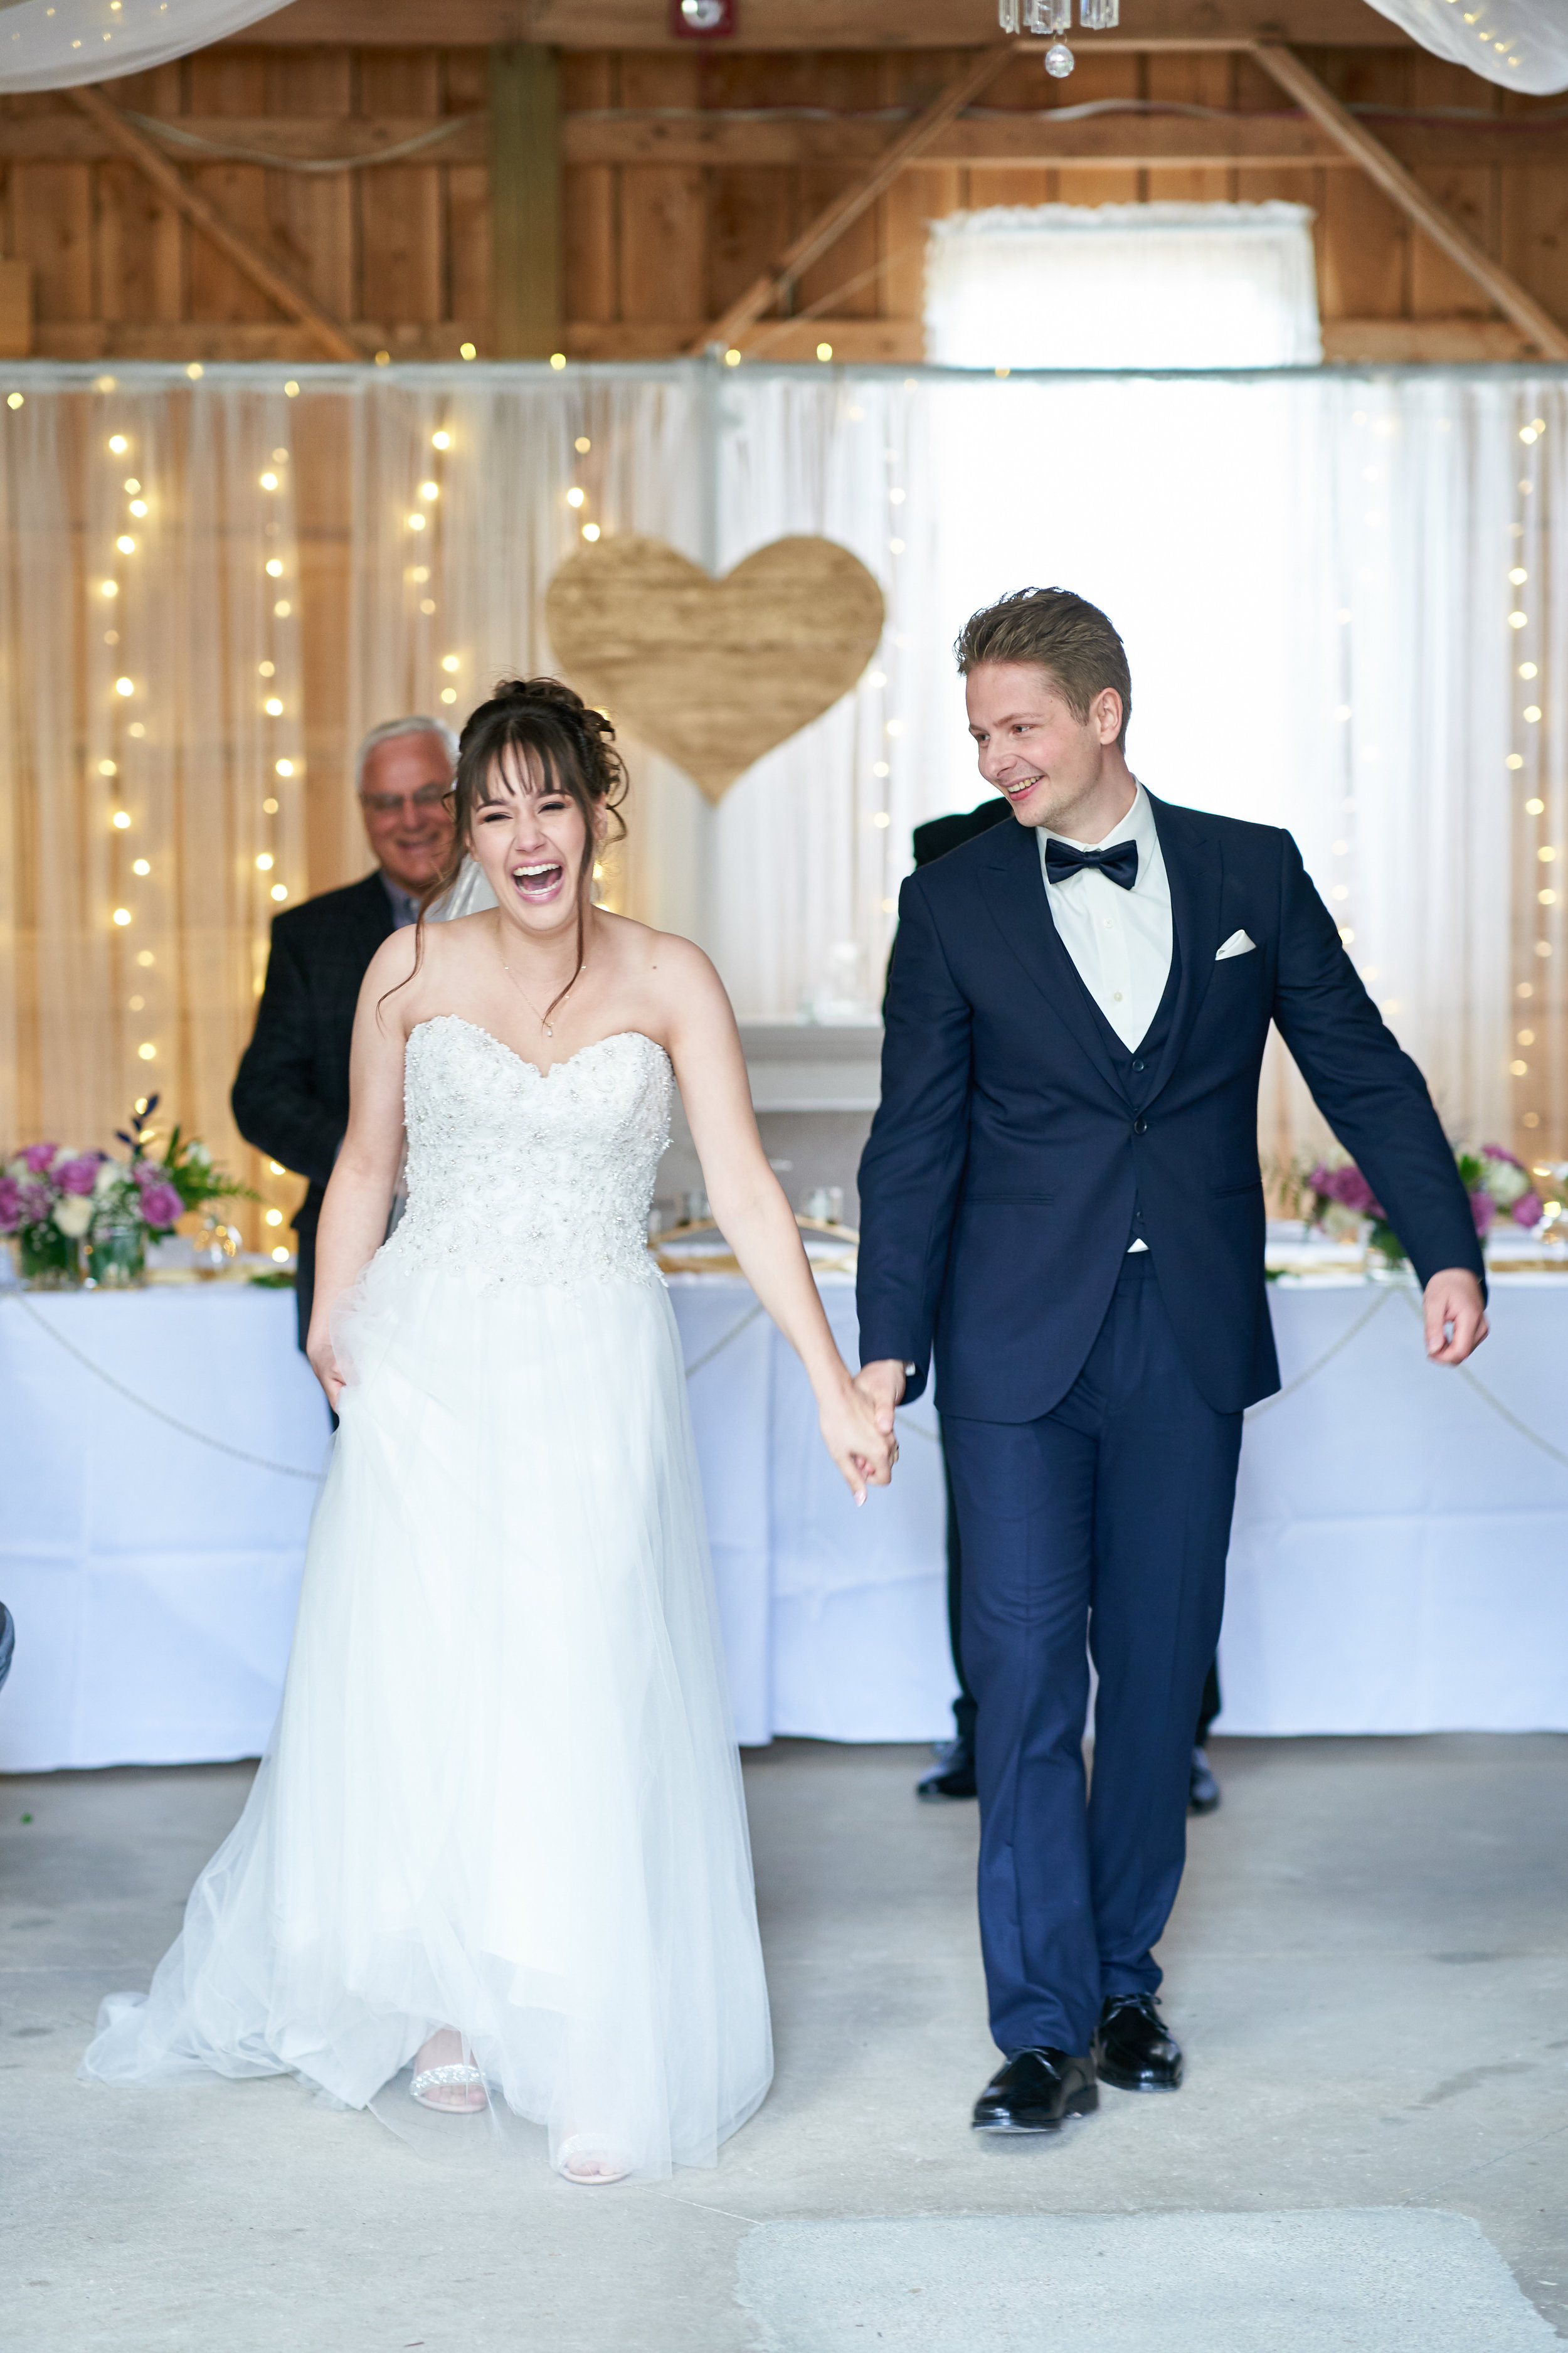 Marcia & Johannes' Wedding - 234.jpg